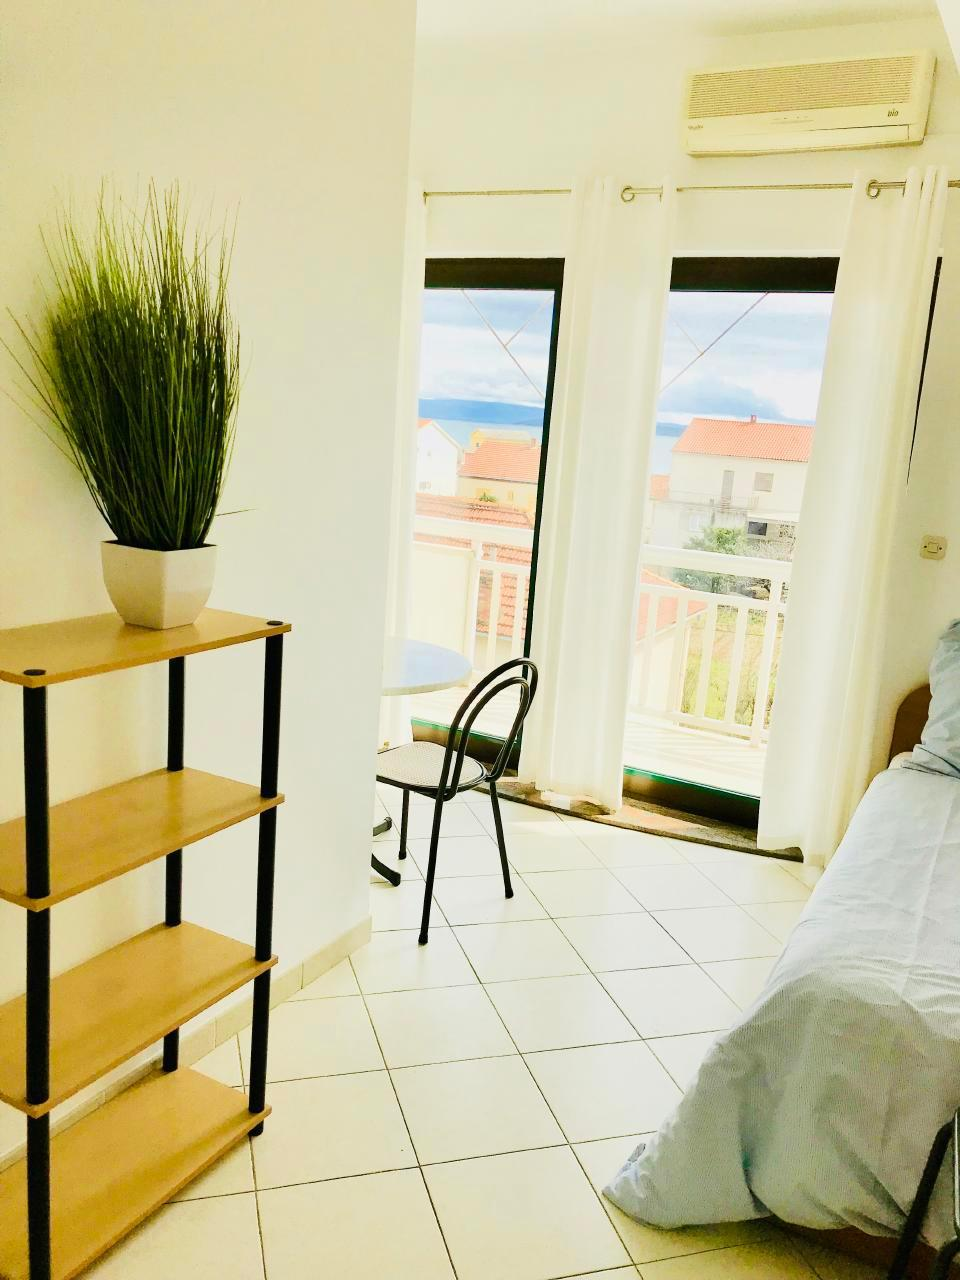 Ferienwohnung Apartmenthaus Ruza 7 - Studio (98388), Kaštel Štafilić, , Dalmatien, Kroatien, Bild 8